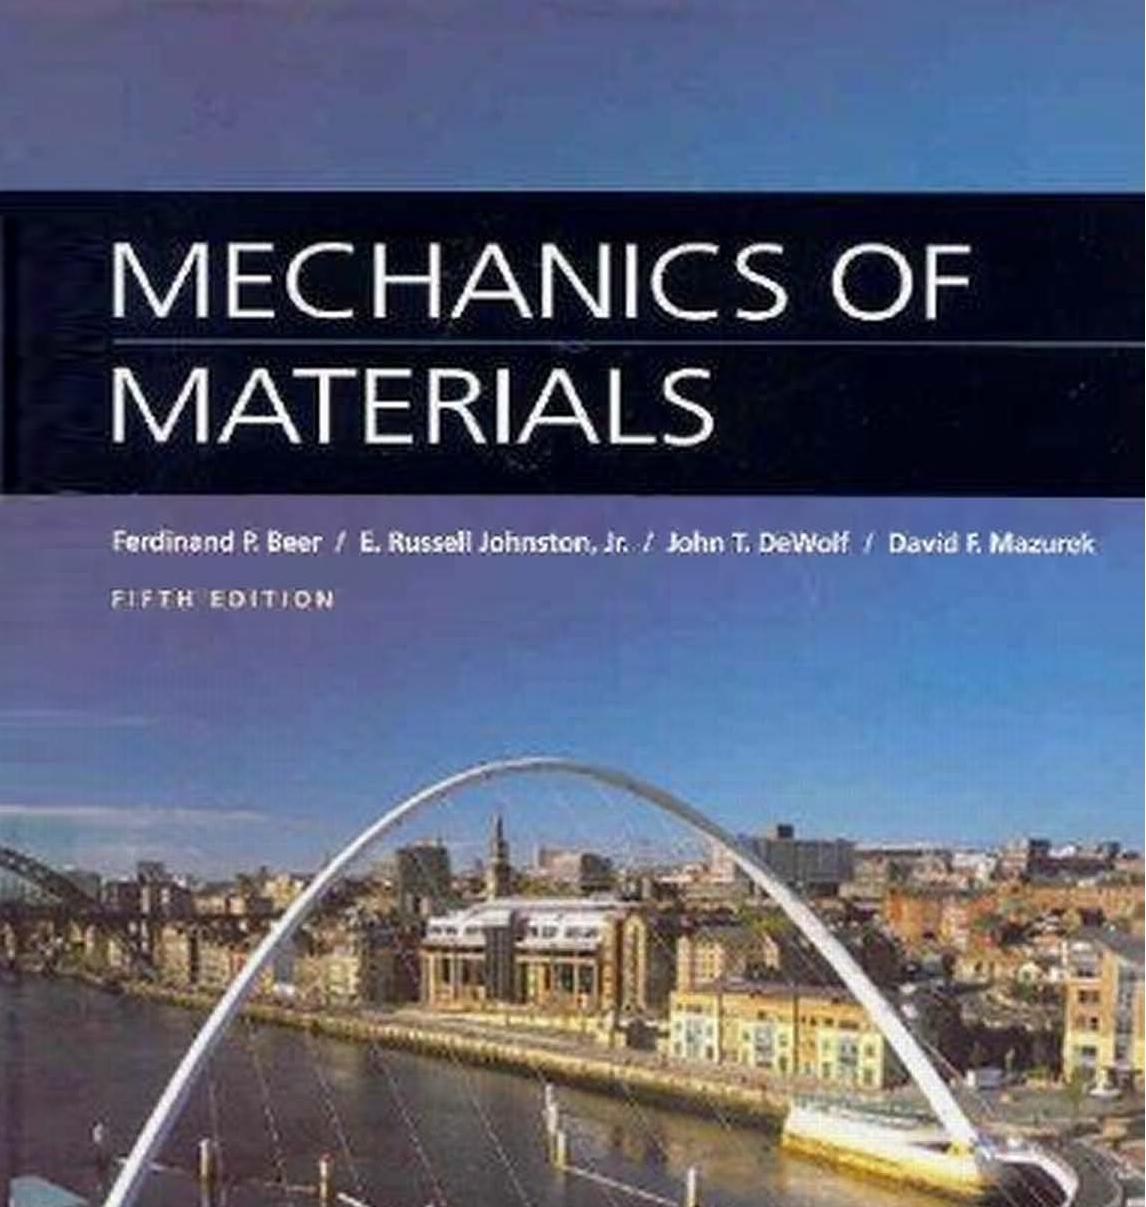 fluid mechanics yunus cengel pdf free download